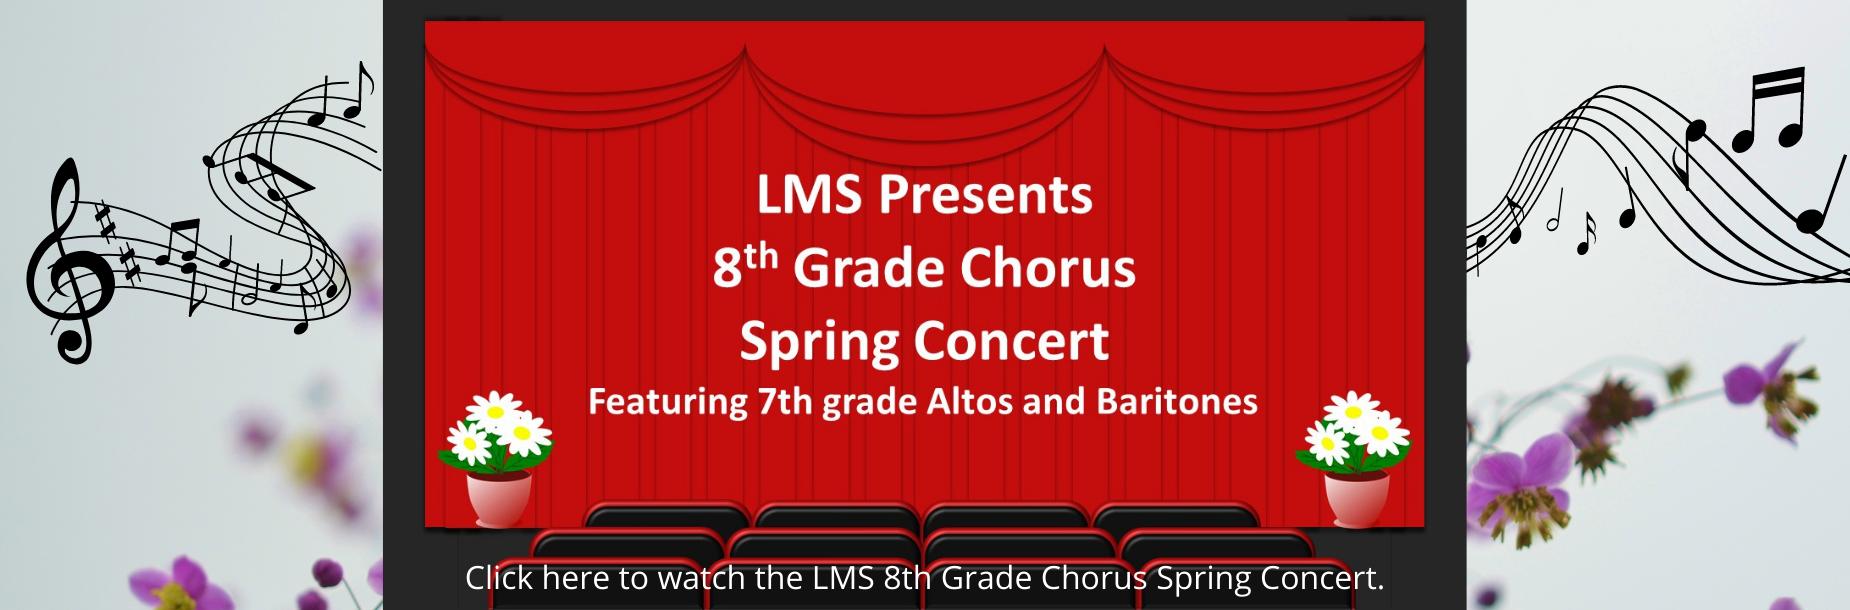 8th grade chorus spring concert link